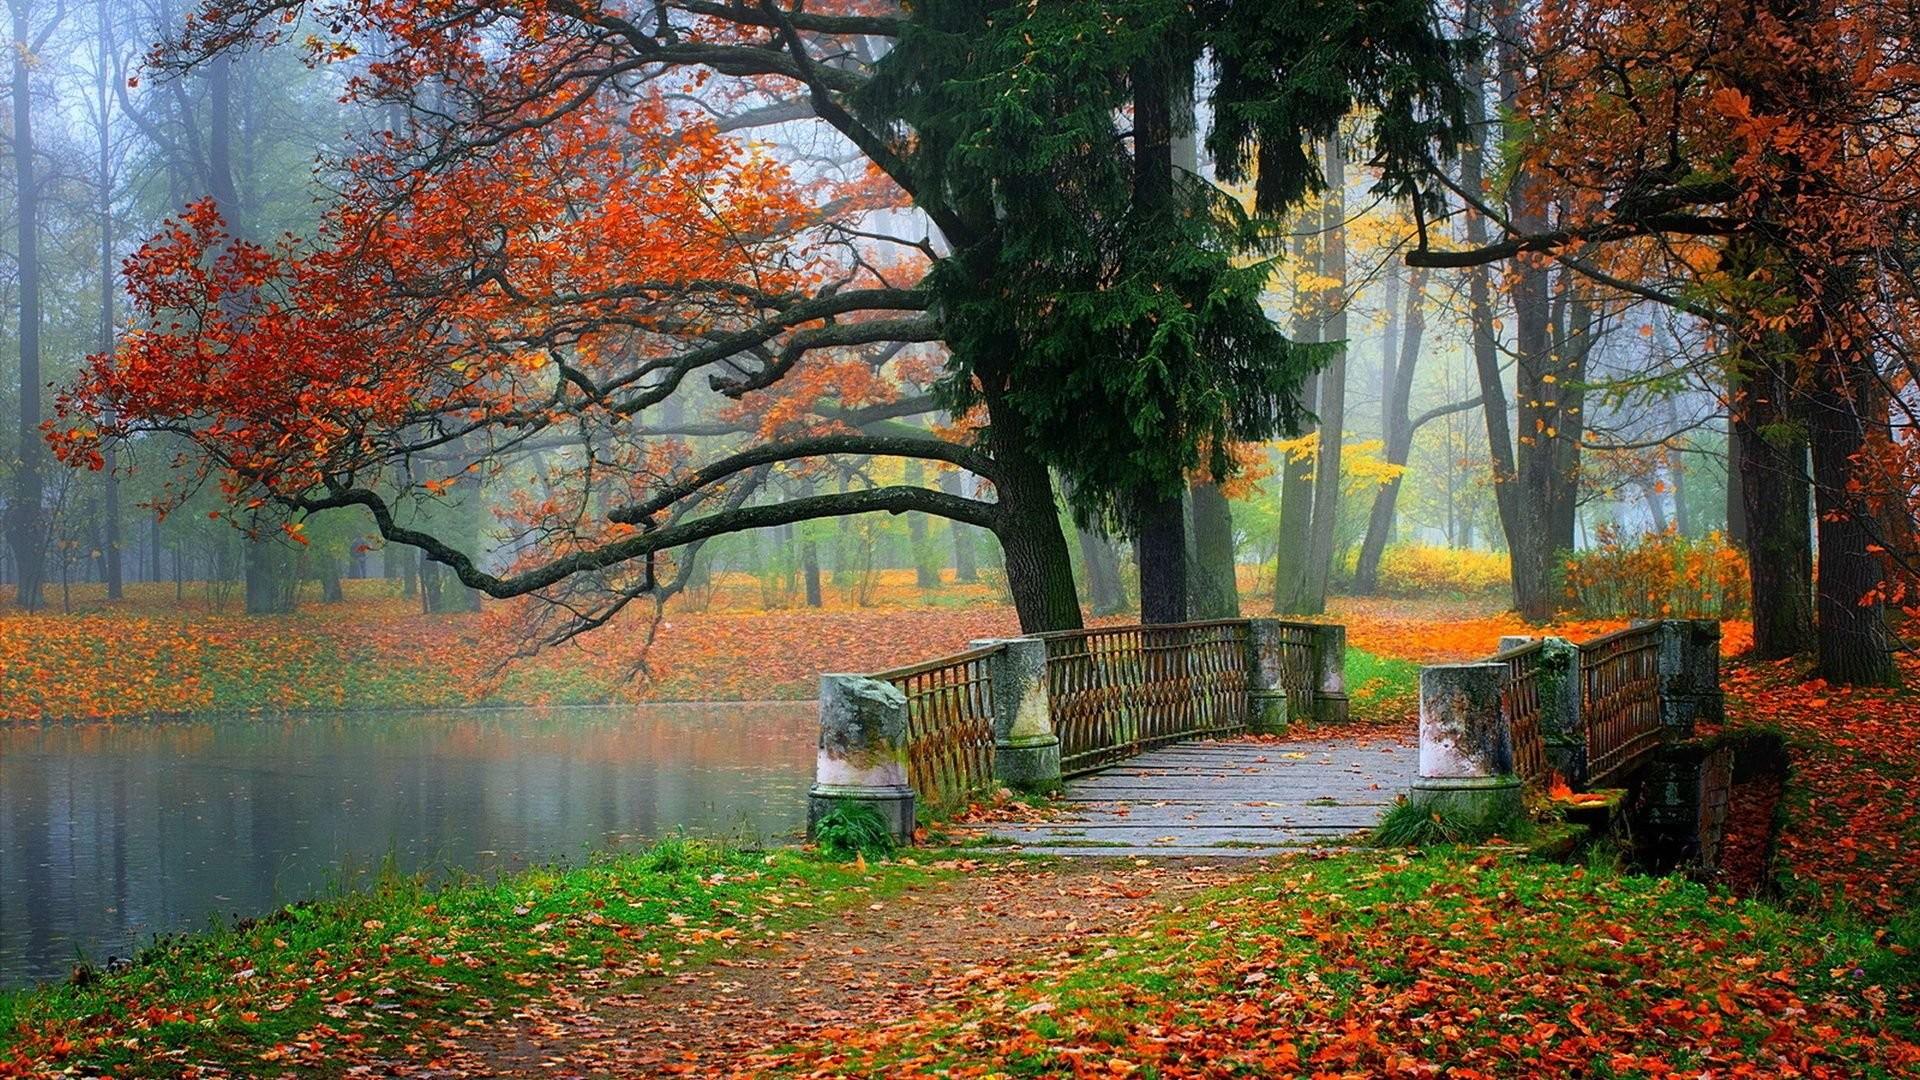 Autumn HD Landscape Wallpapers Beauty Tree Bridge Tablet 1920x1080